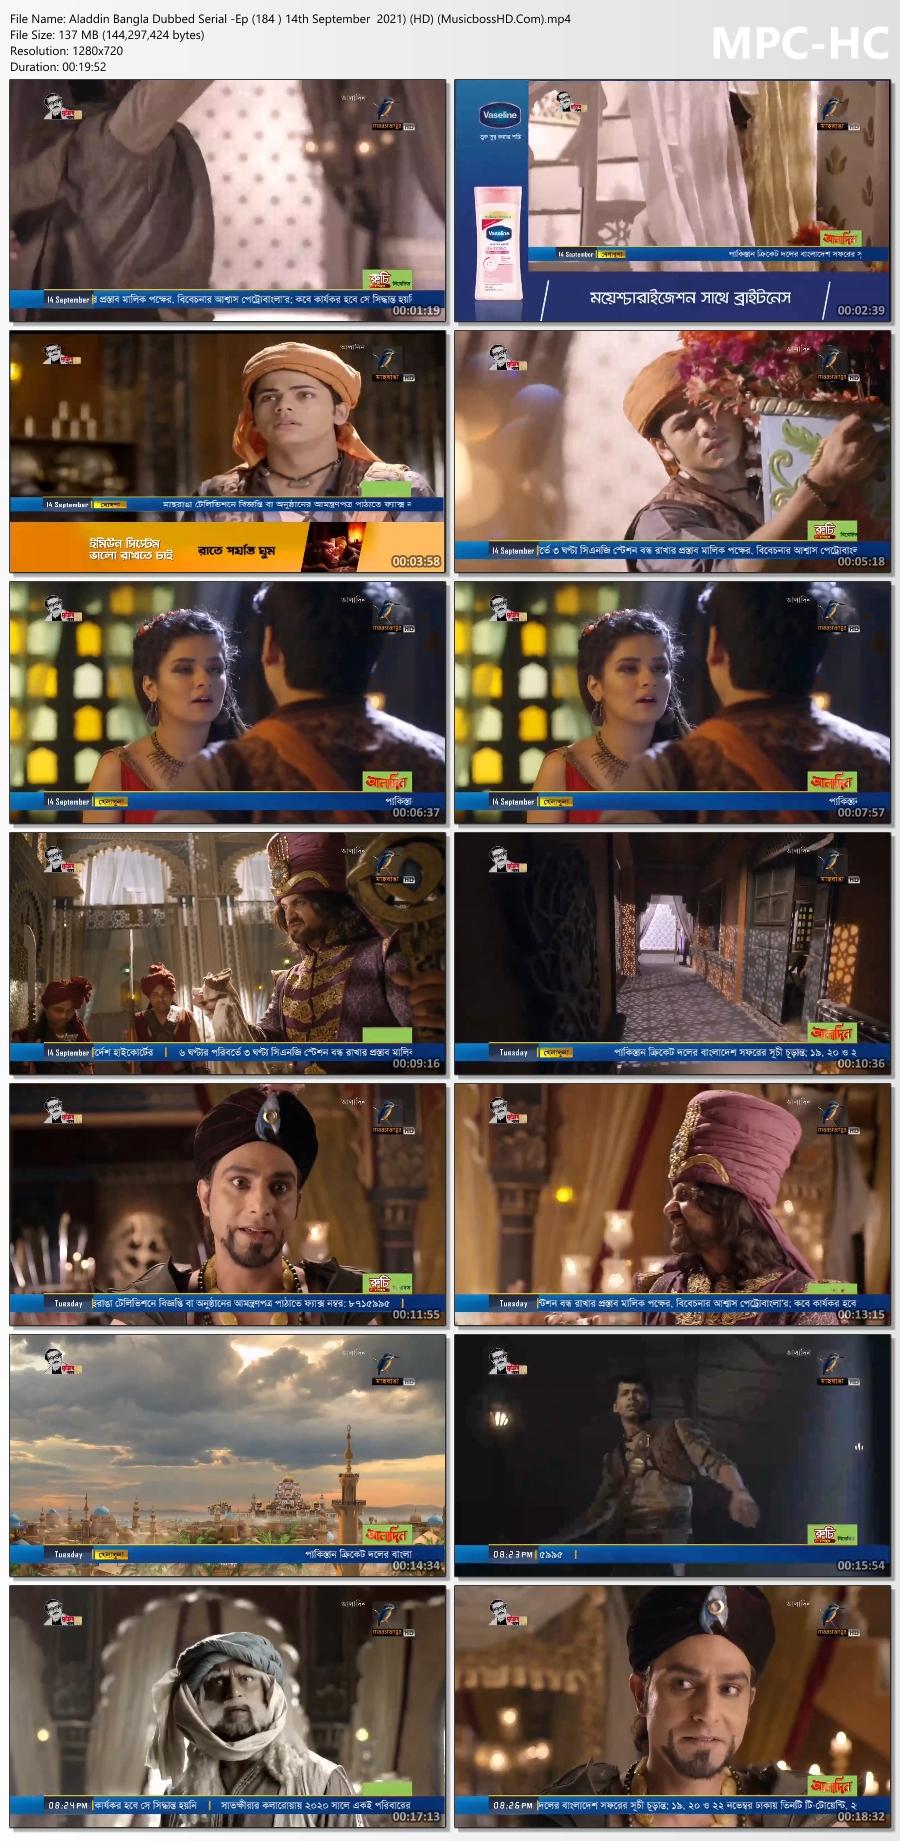 Aladdin-Bangla-Dubbed-Serial-Ep-184-14th-September-2021-HD-Musicboss-HD-Com-mp4-thumbs